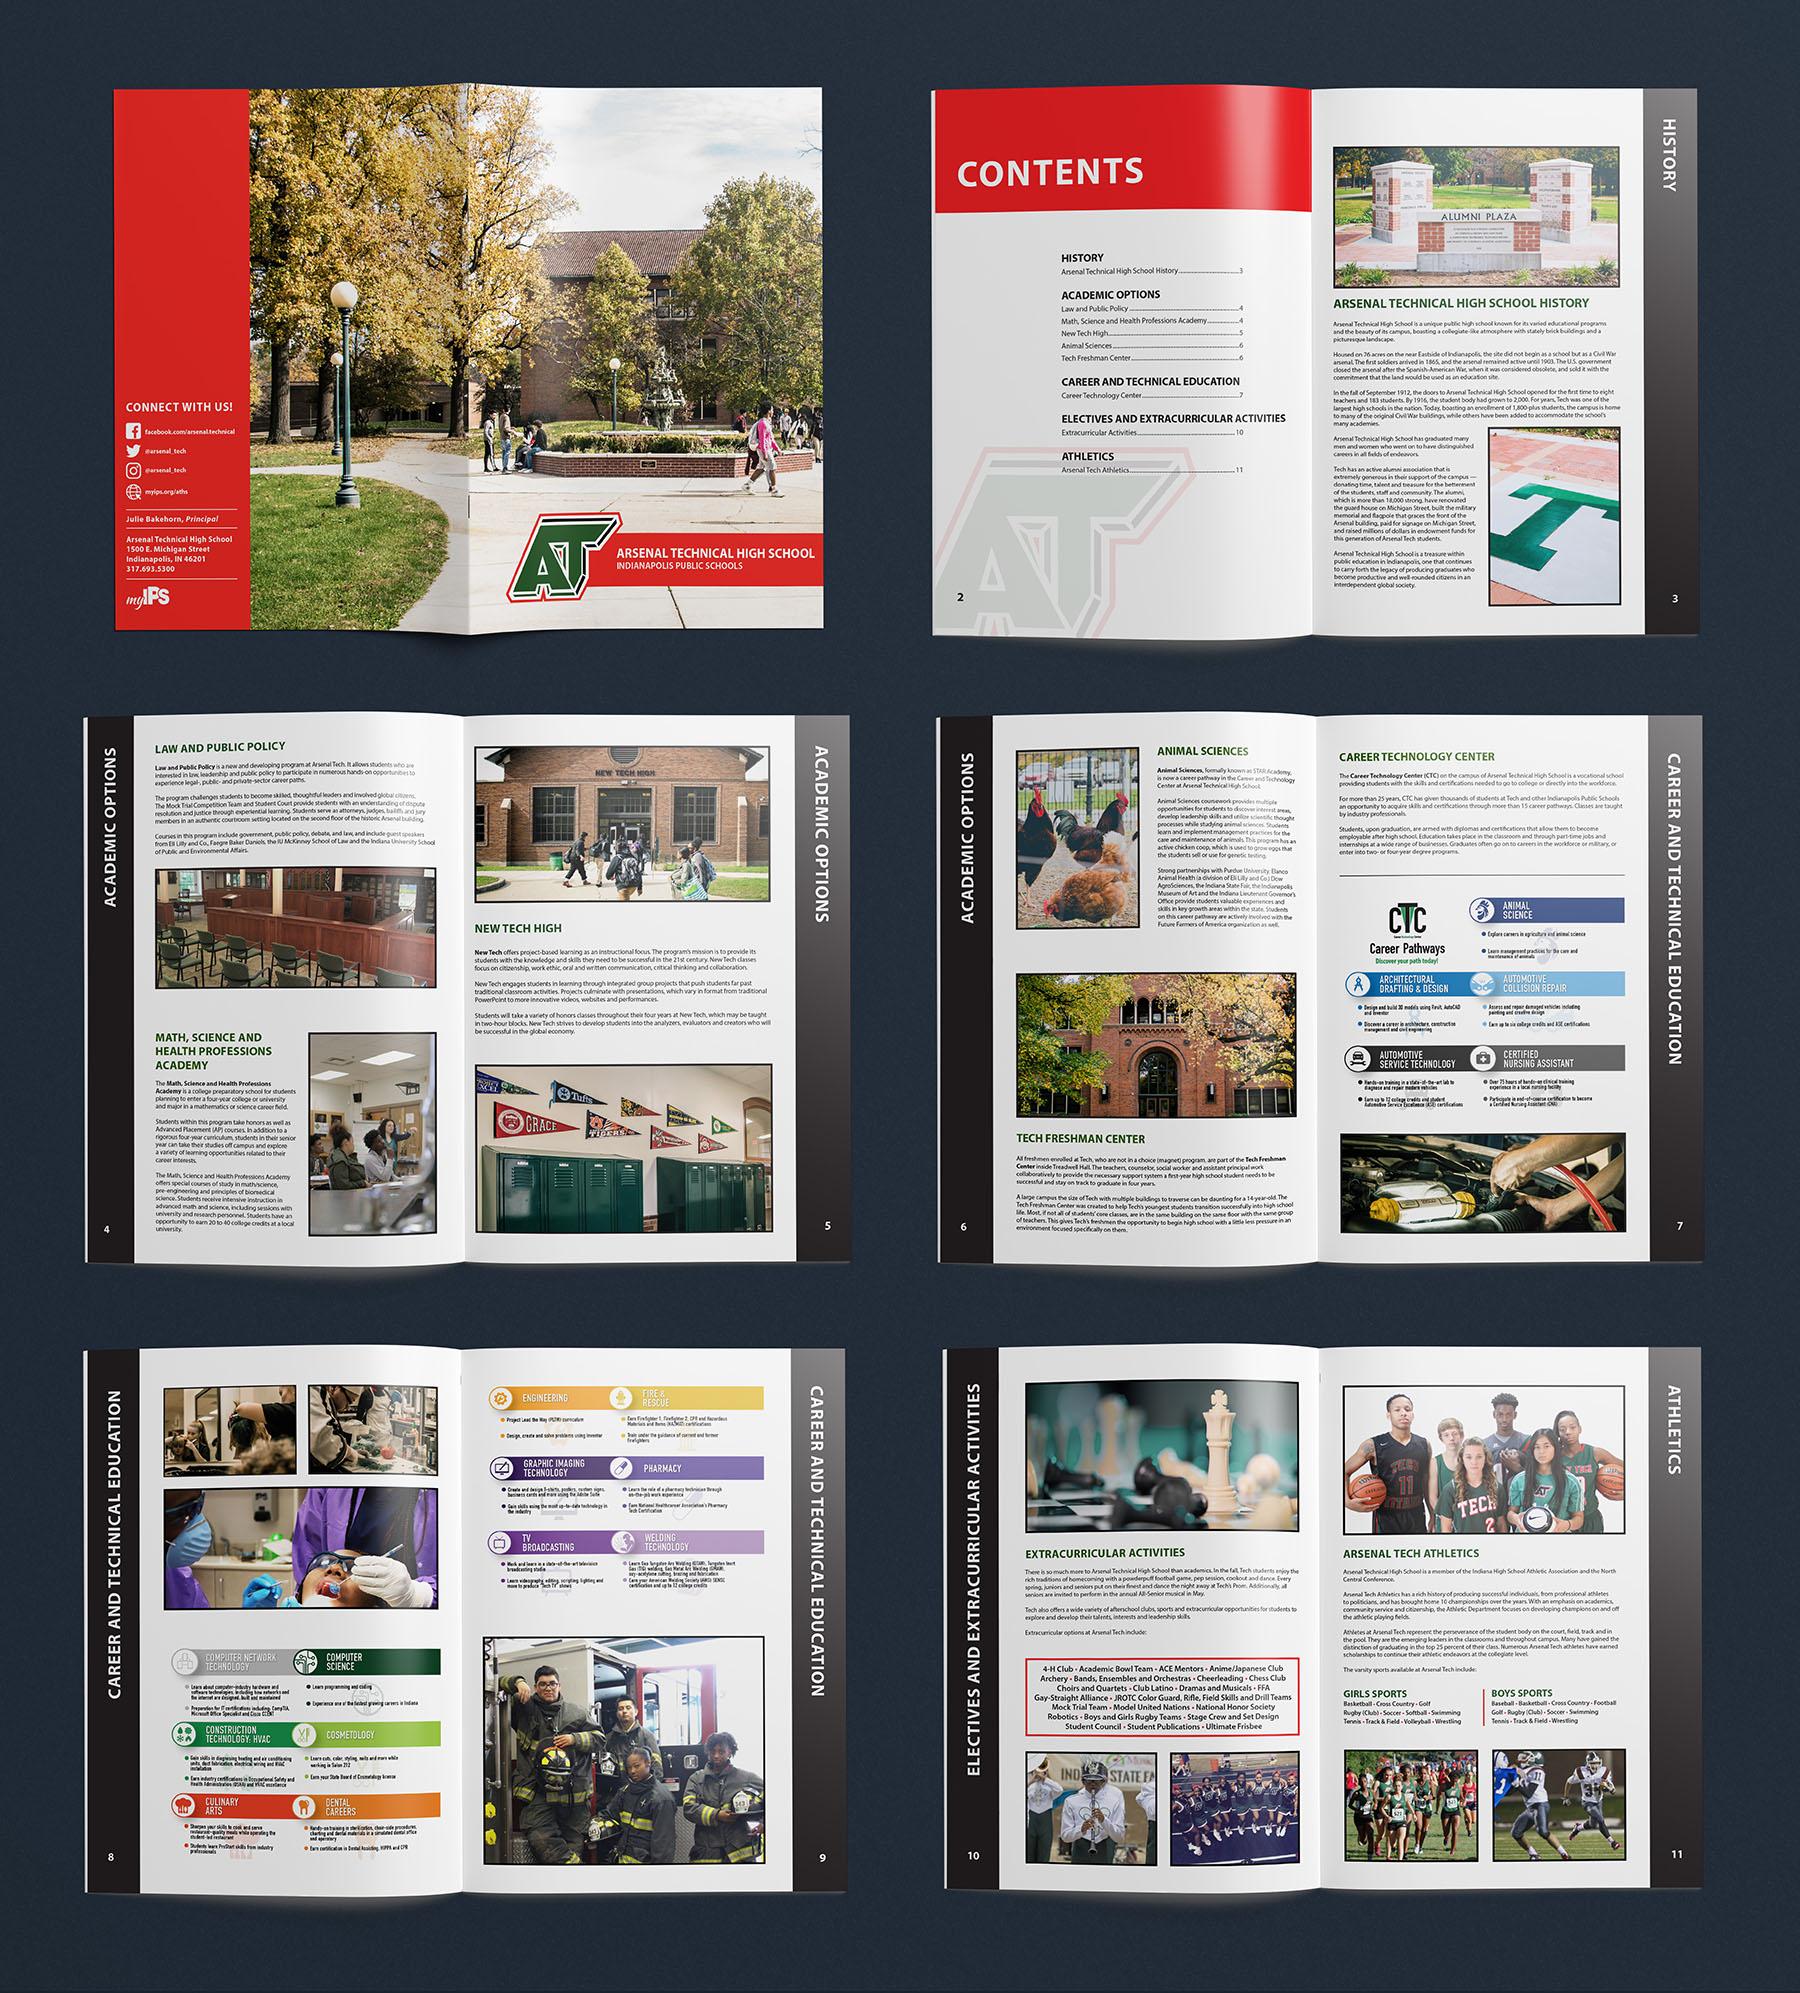 Indianapolis Publice Schools - Arsenal Technical High School Campus Book